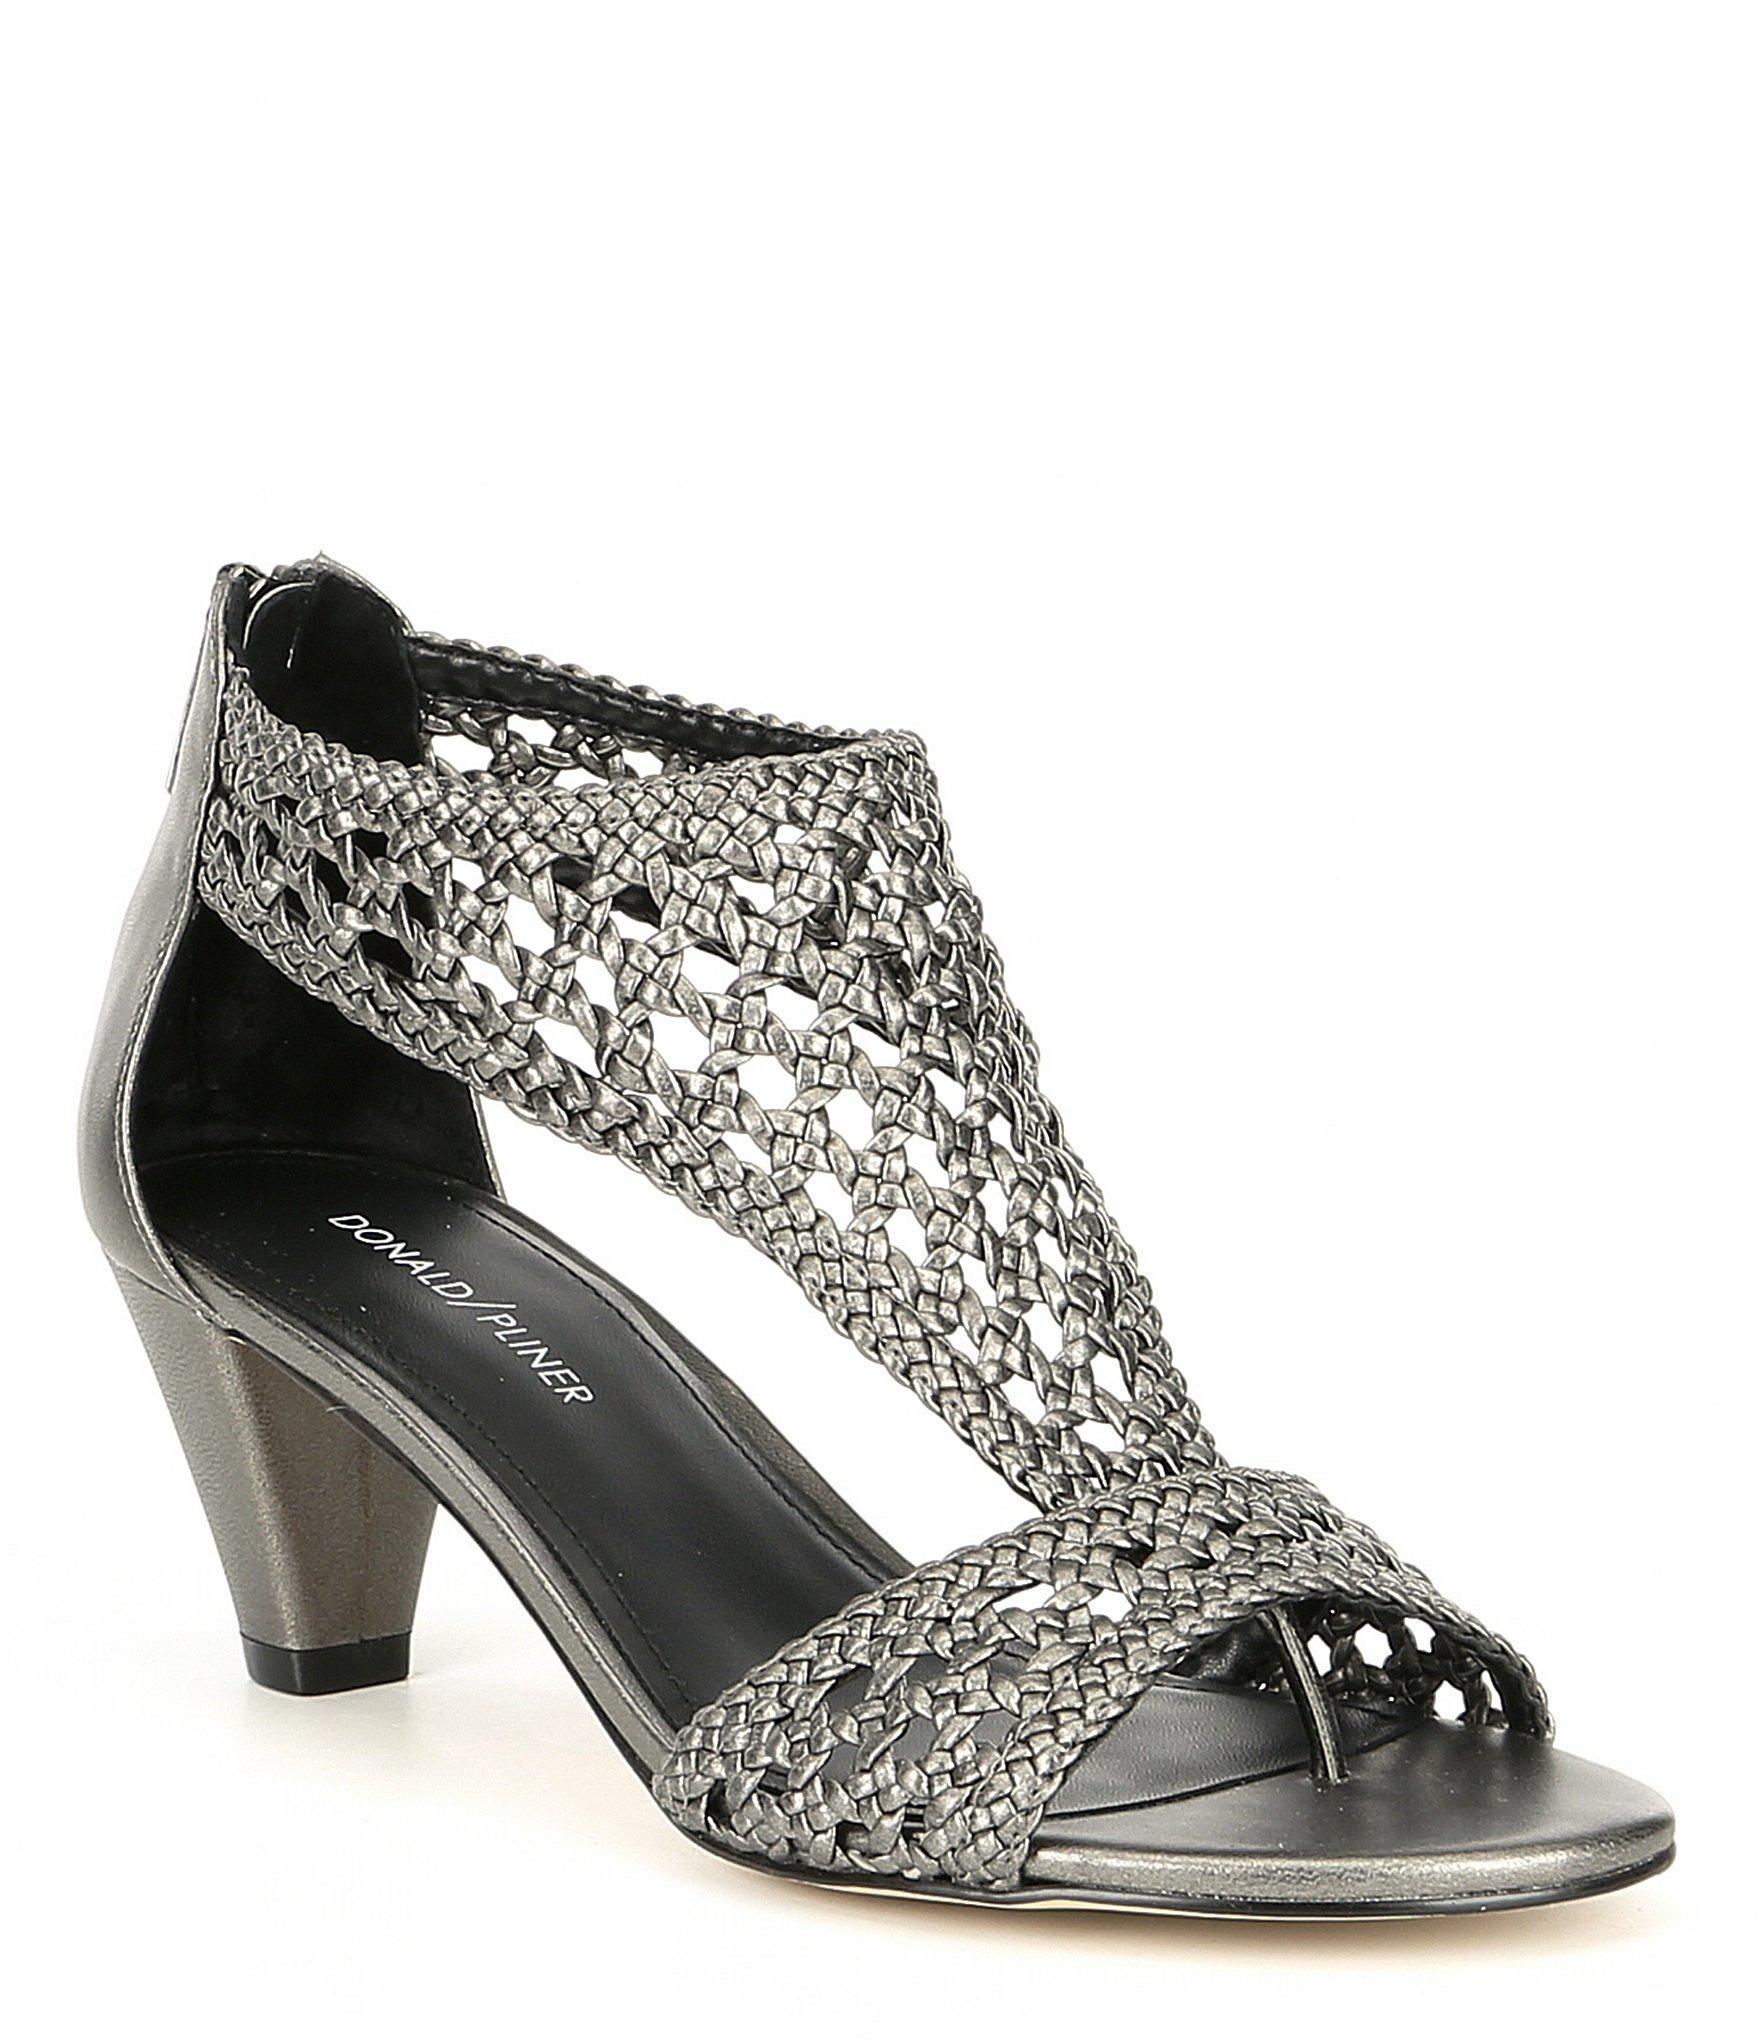 64bae53902d Lyst - Donald J Pliner Verona2 Woven Metallic Leather Dress Sandals